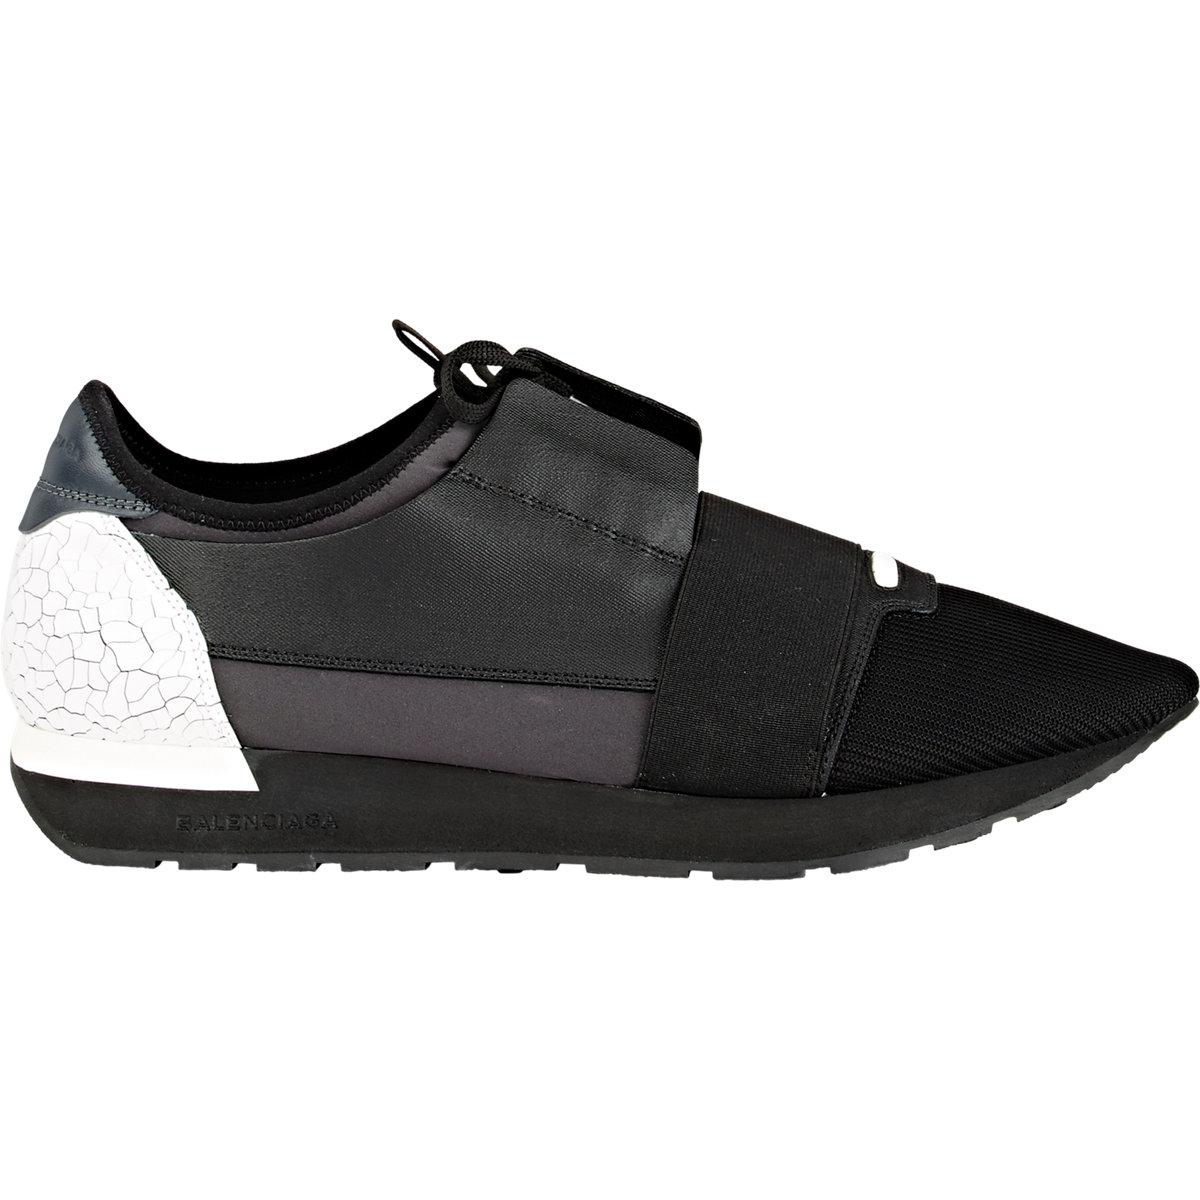 c475534898ee Lyst - Balenciaga Multi-material Race Sneakers in Black for Men